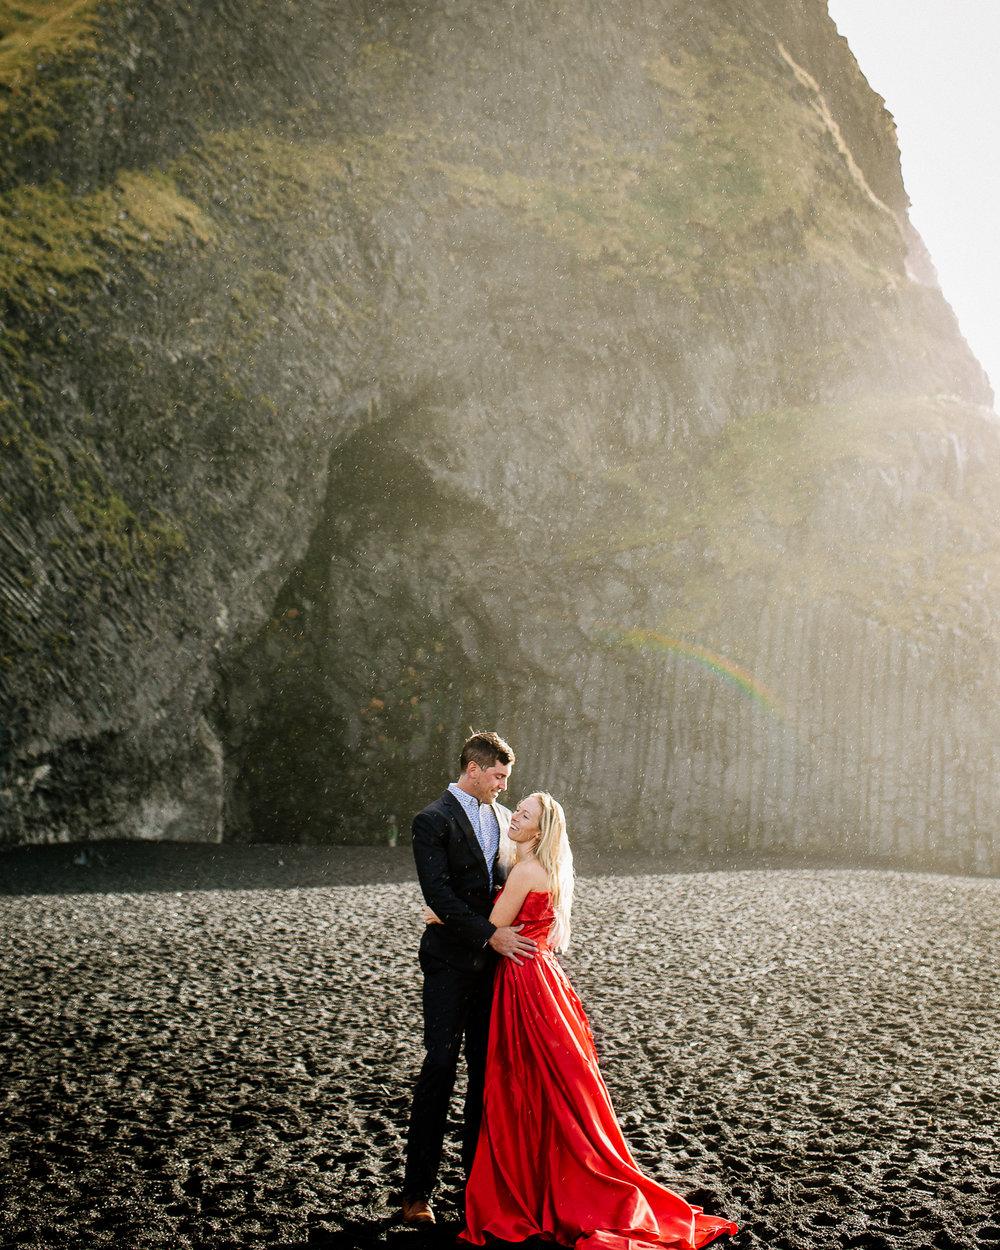 Jen_Montgomery_Photography_Iceland_JenAlex_Engagement_sm-4.jpg